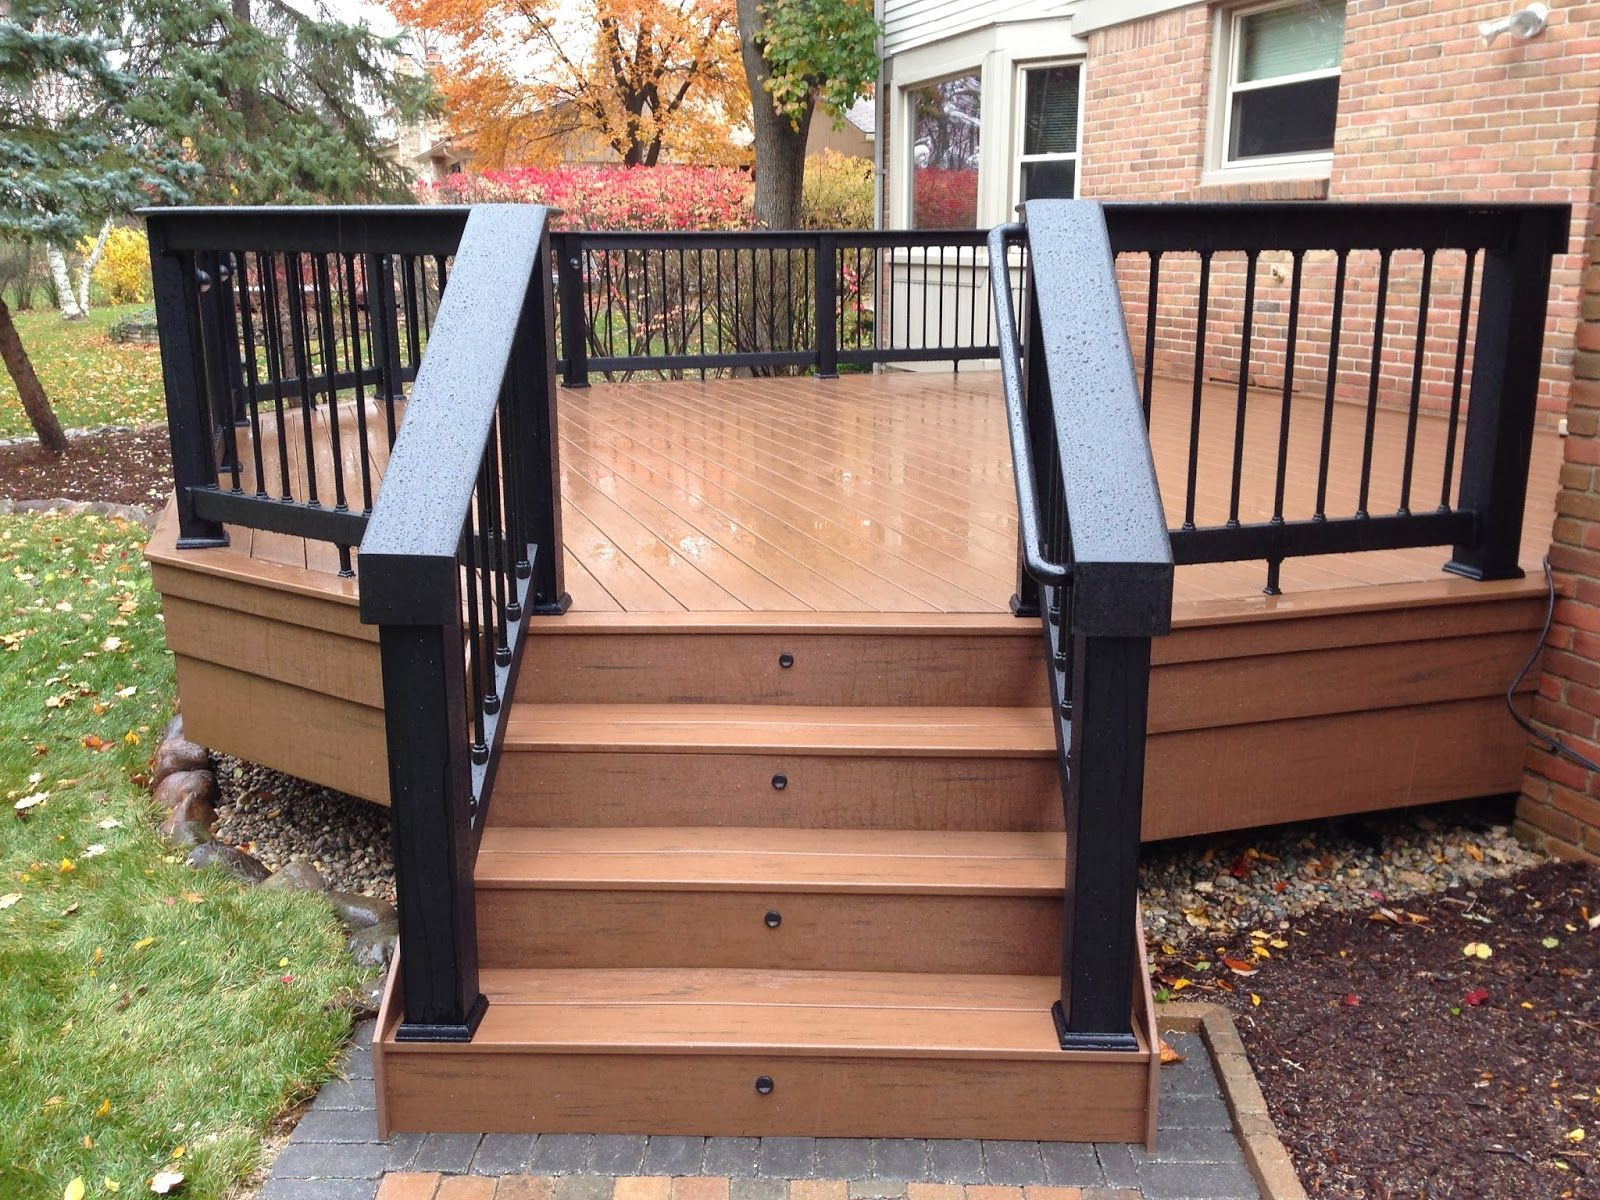 Grabbing Exterior Beauty with Small Backyard Deck Ideas